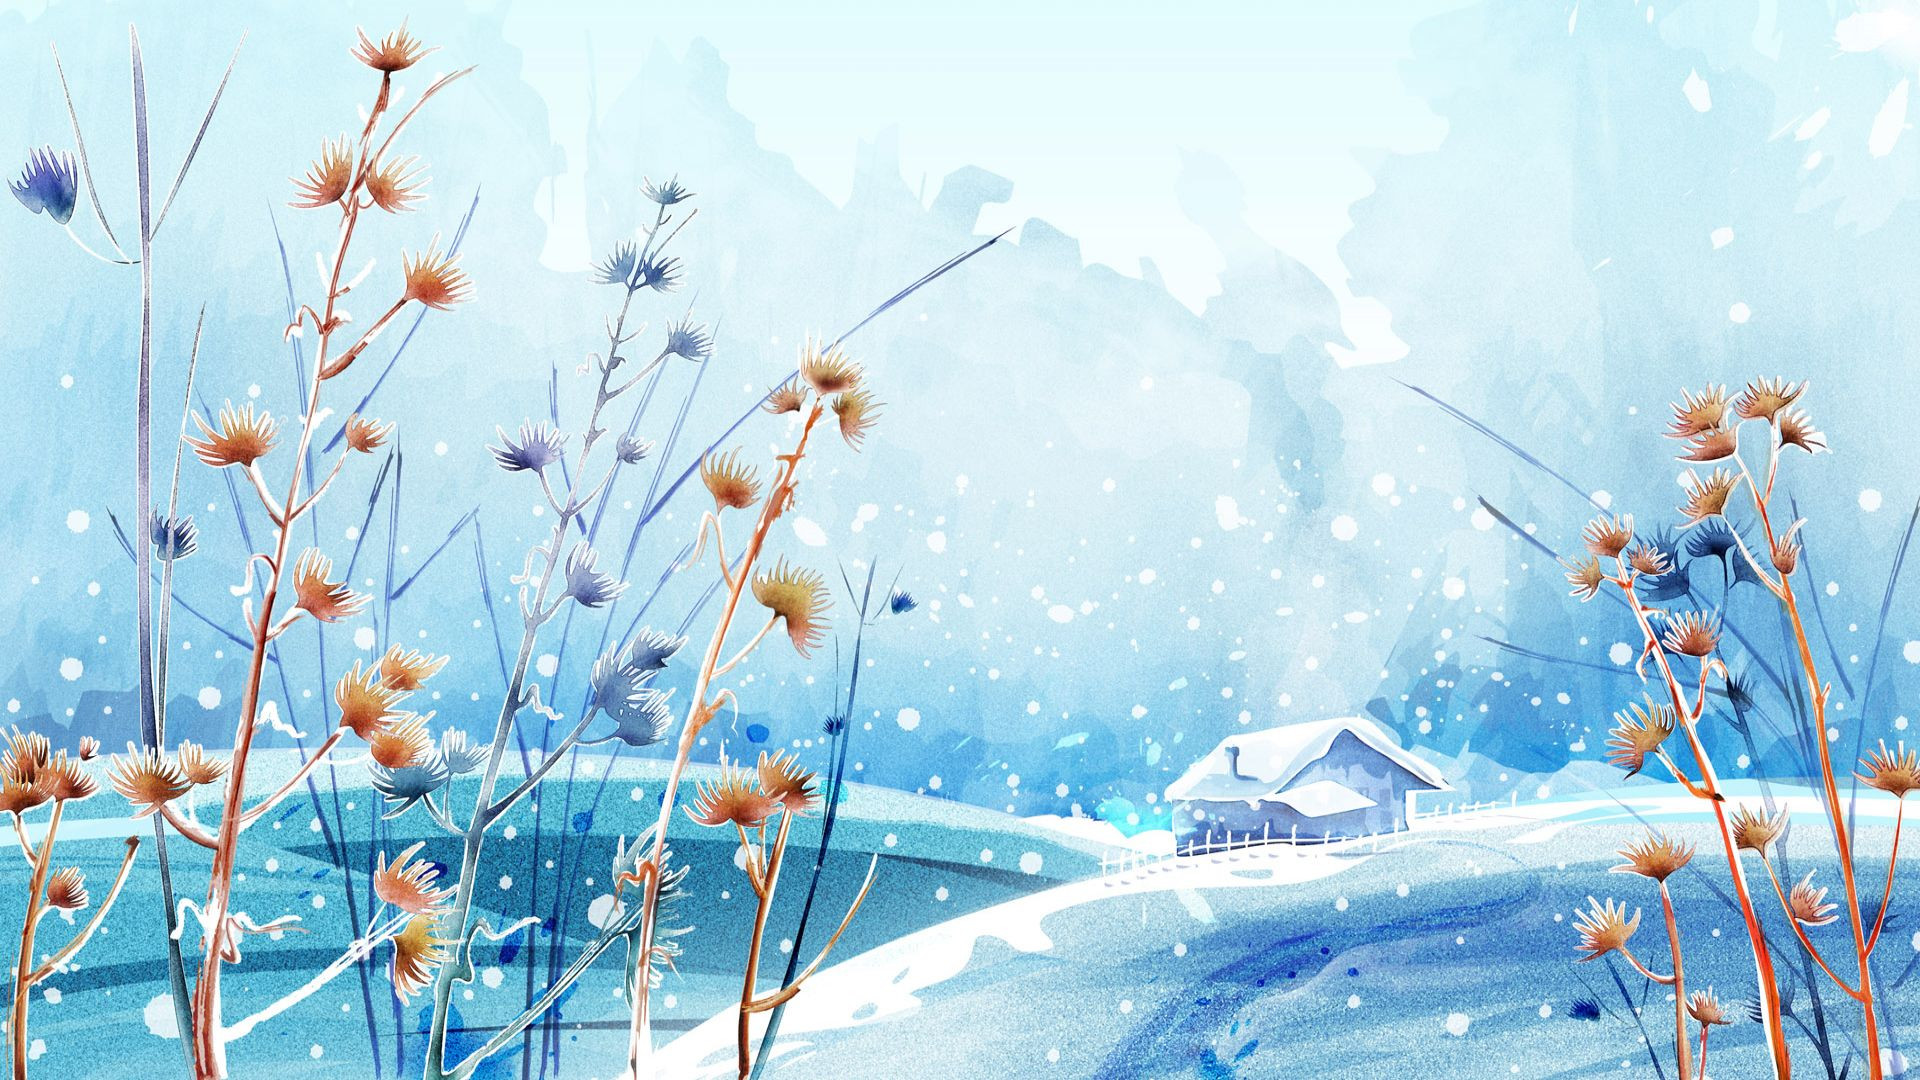 Desktop Wallpaper Winter